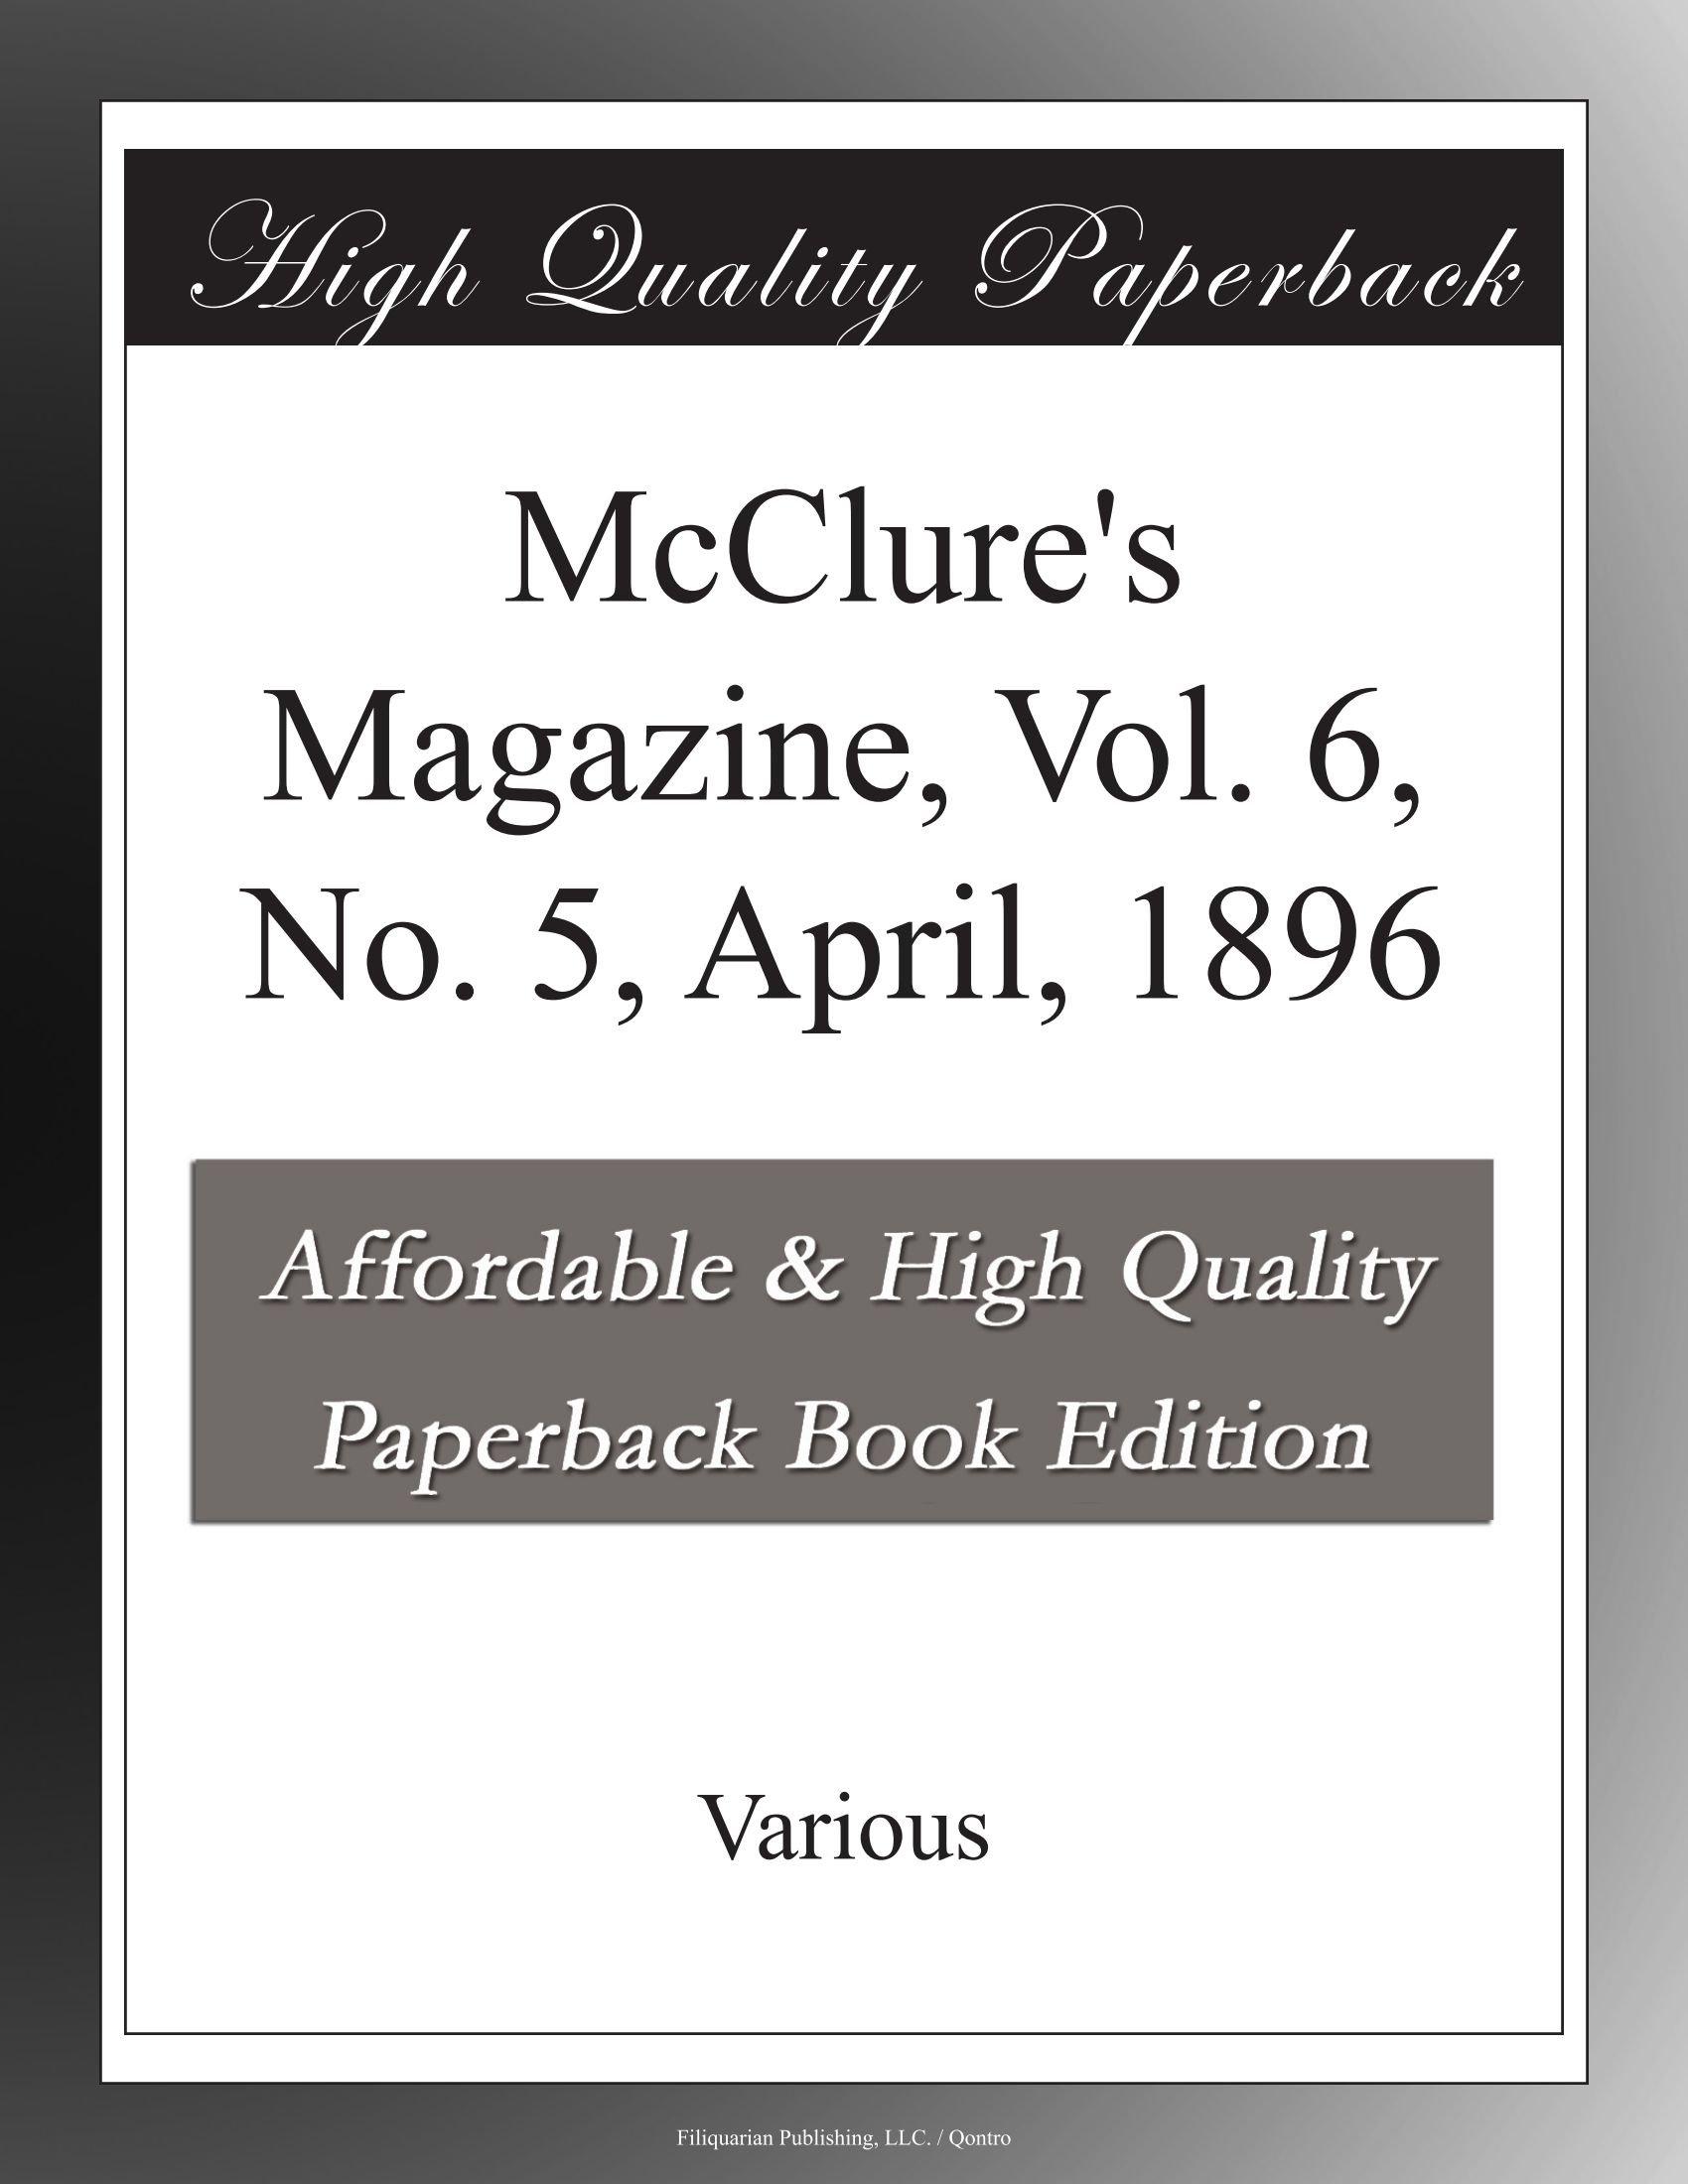 McClure's Magazine, Vol. 6, No. 5, April, 1896 PDF